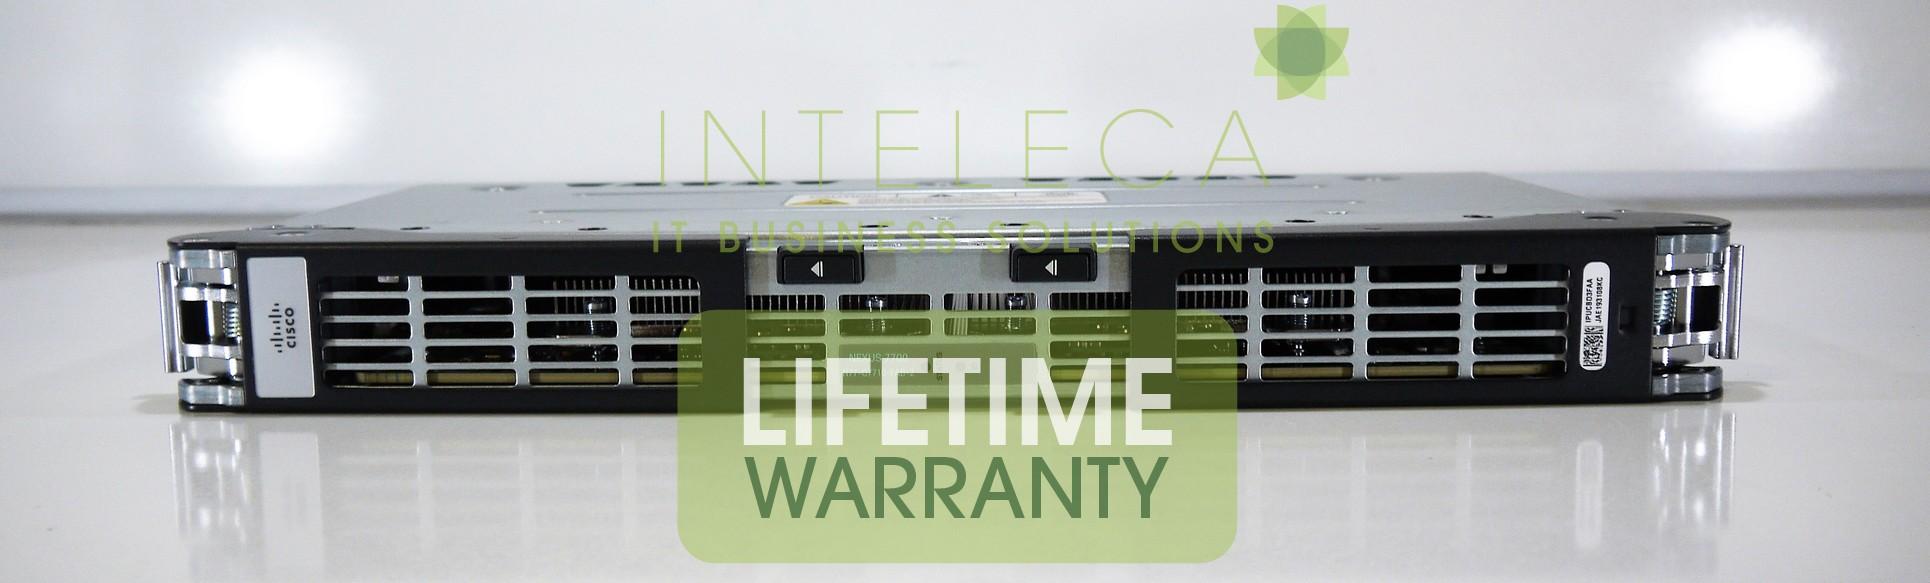 Cisco N77 C7710 Fab 2 Nexus 7700 10 Slot Chassis 220gbps